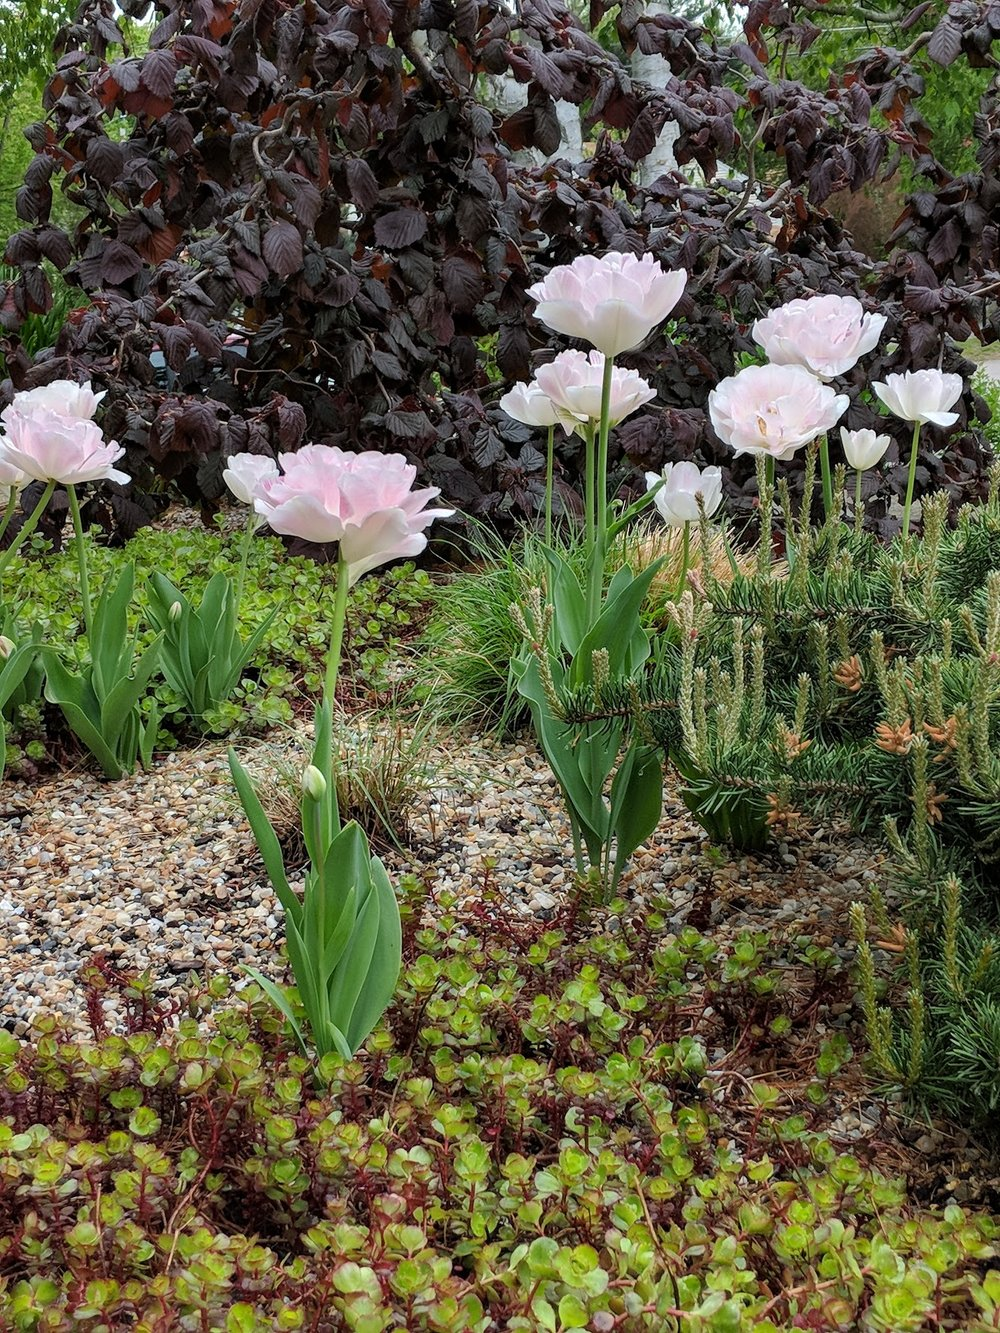 'Angelique' tulips in gravel bed with Harry Lauder Walking Stick tree